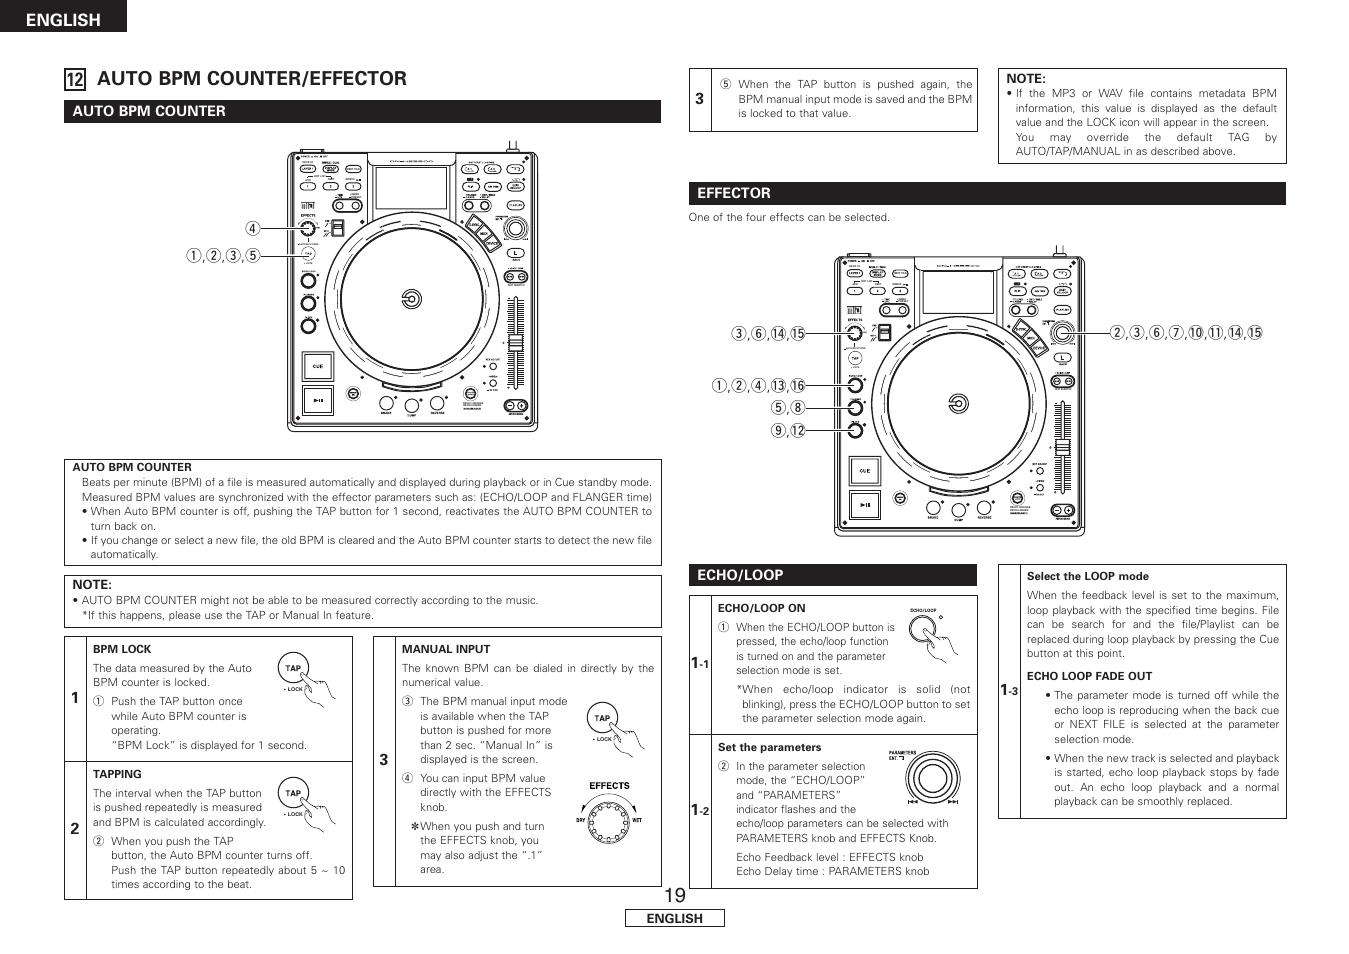 Auto bpm counter/effector, Auto bpm counter, Effector